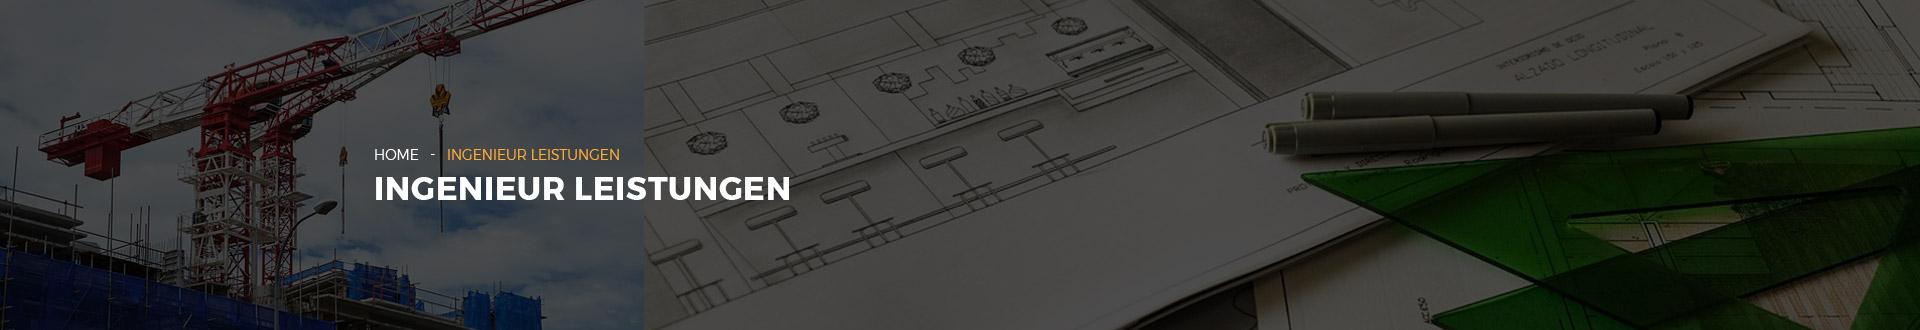 https://arslan-engineering.de/wp-content/uploads/2017/05/header-leistungen-ingenieur-1.jpg